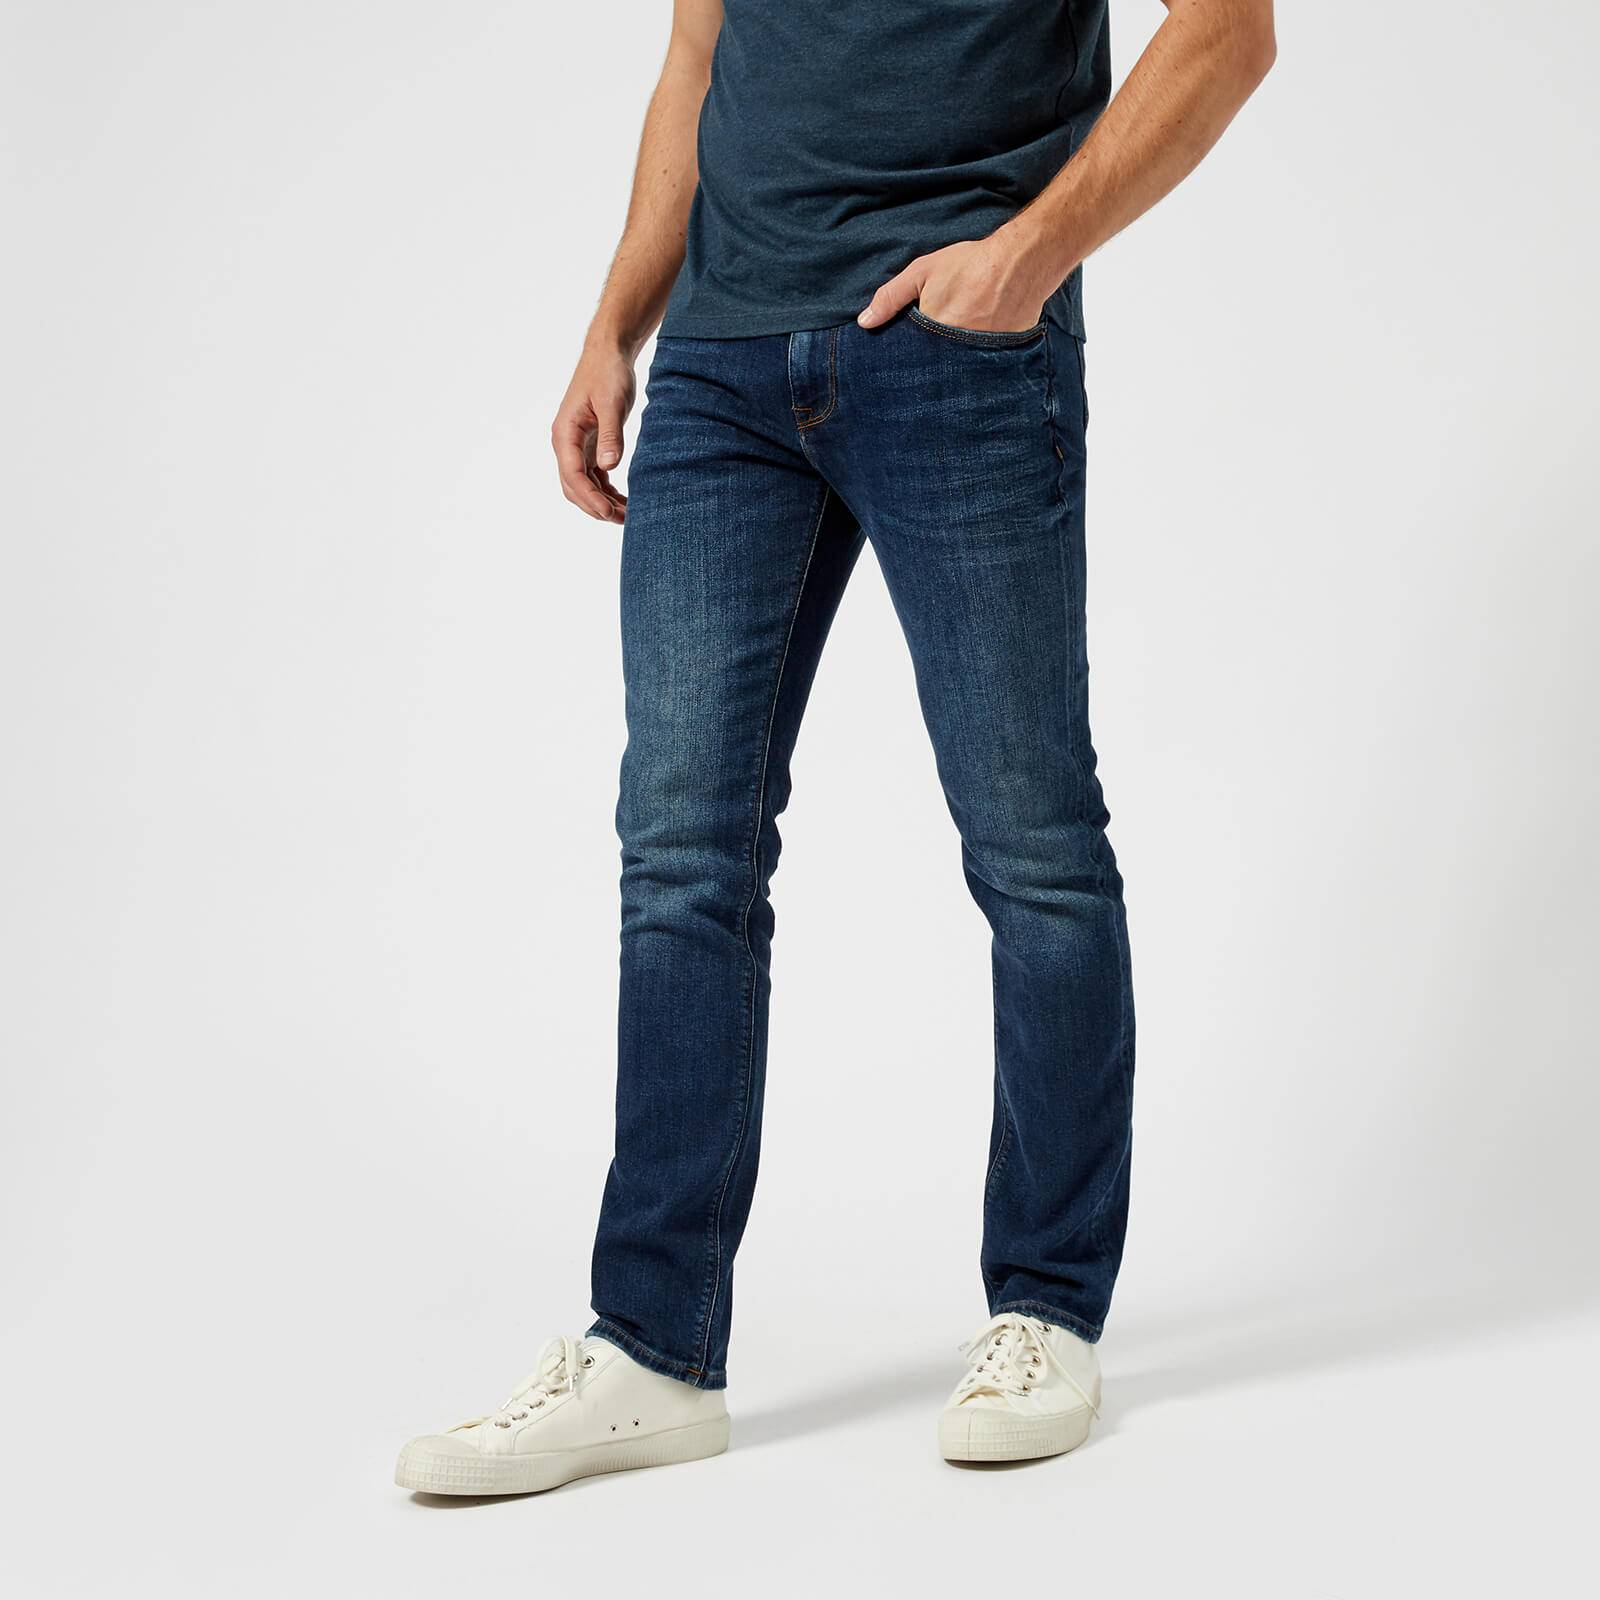 Tommy Hilfiger Men's Core Denton Straight Jeans - New Dark Stone - W32/L34